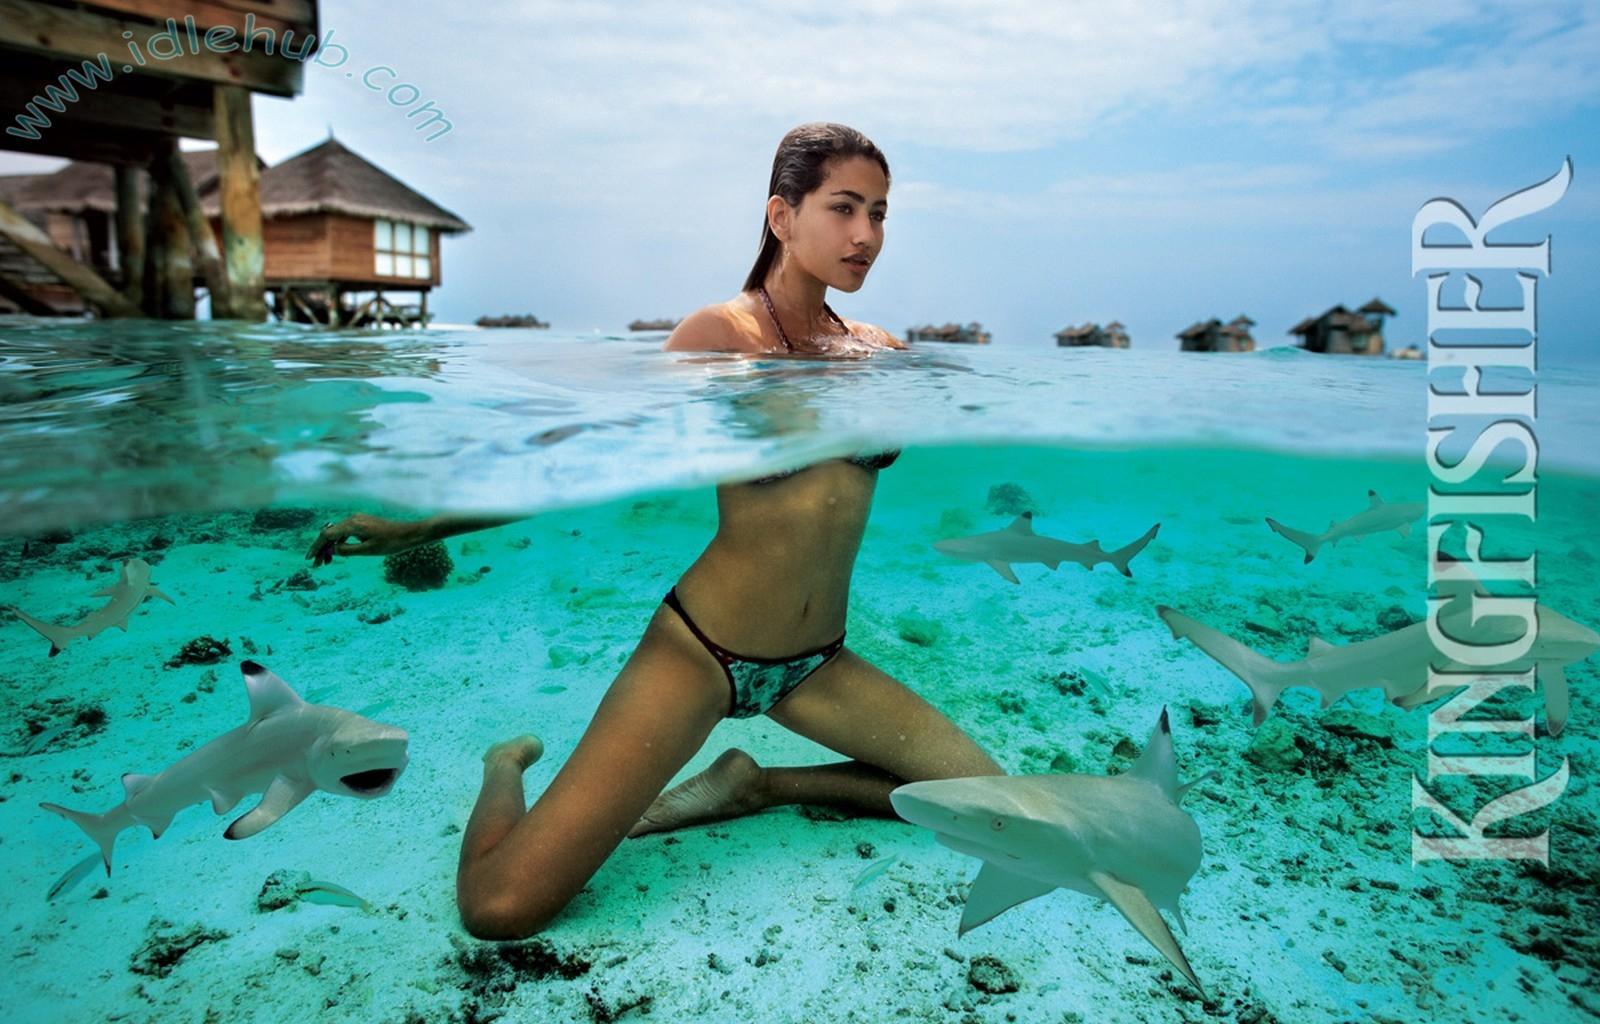 Knows it. kingfisher bikini calendar 2009